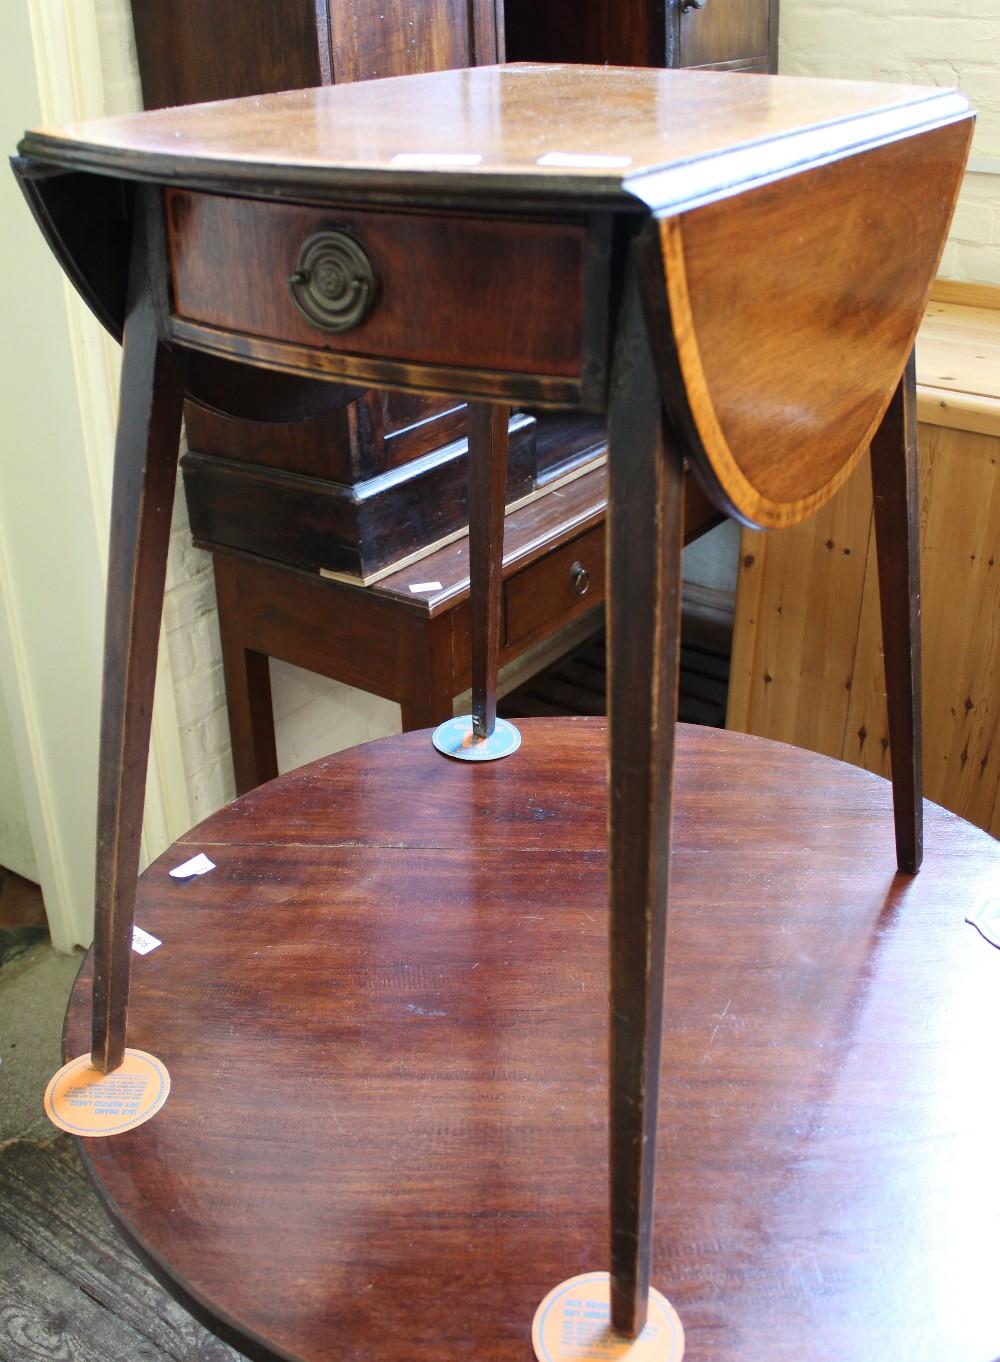 Lot 1004 - An Edwardian splayed leg circular drop leaf table with single drawer